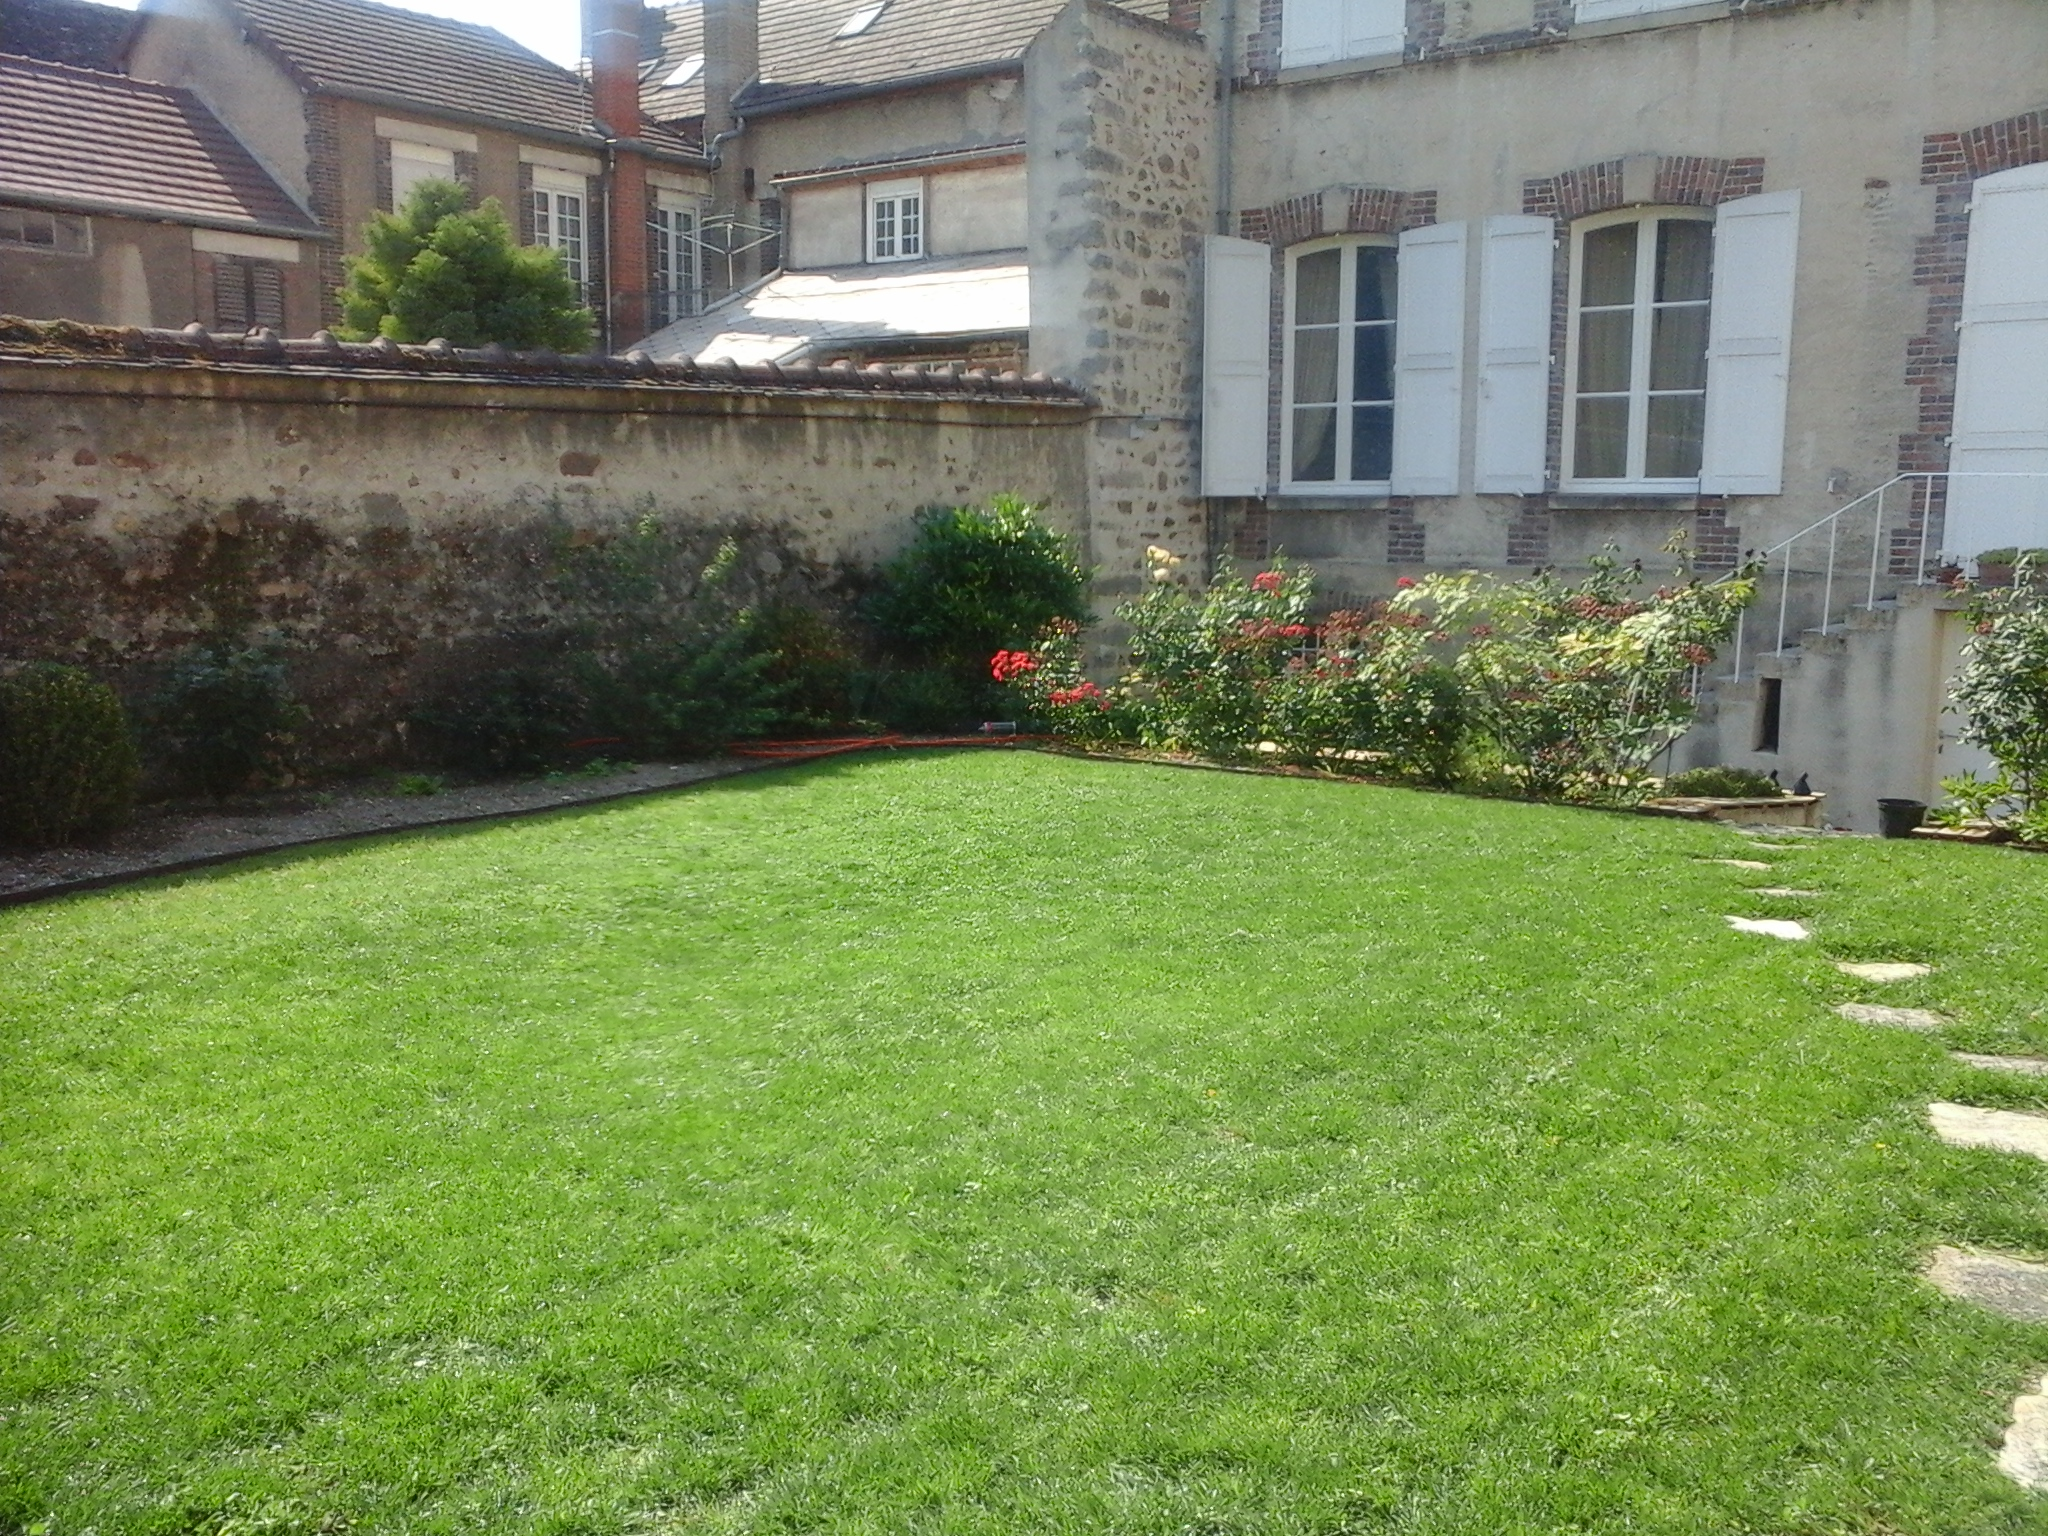 entretien tonte gazon pelouse jardin bois services jean baptiste savourat artisan paysagiste. Black Bedroom Furniture Sets. Home Design Ideas